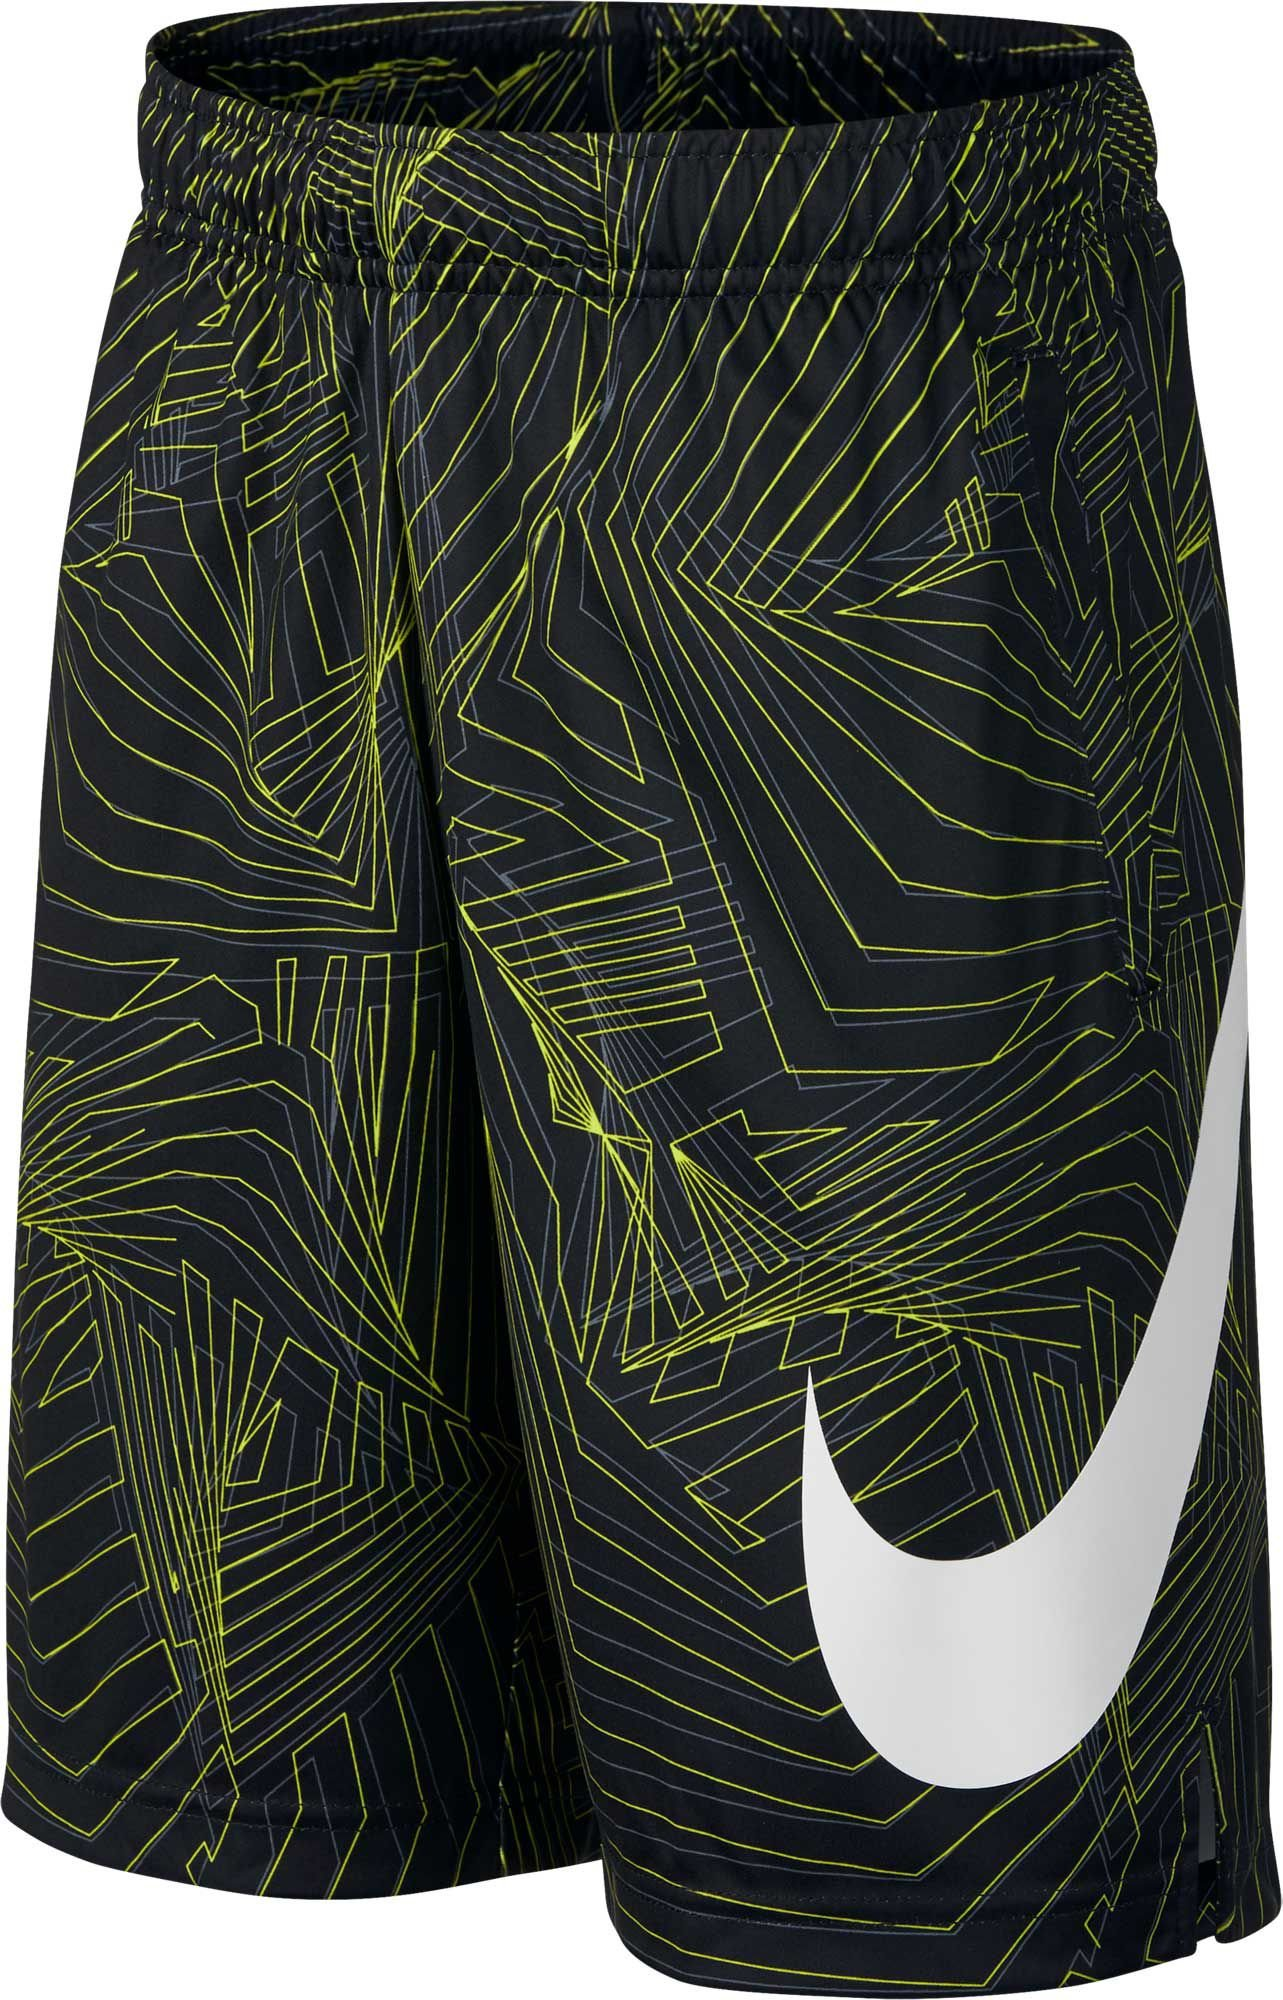 NIKE Big Kids' (Boys') Dri-FIT Training Shorts (Black(892490-010)/Cool Grey, Small)